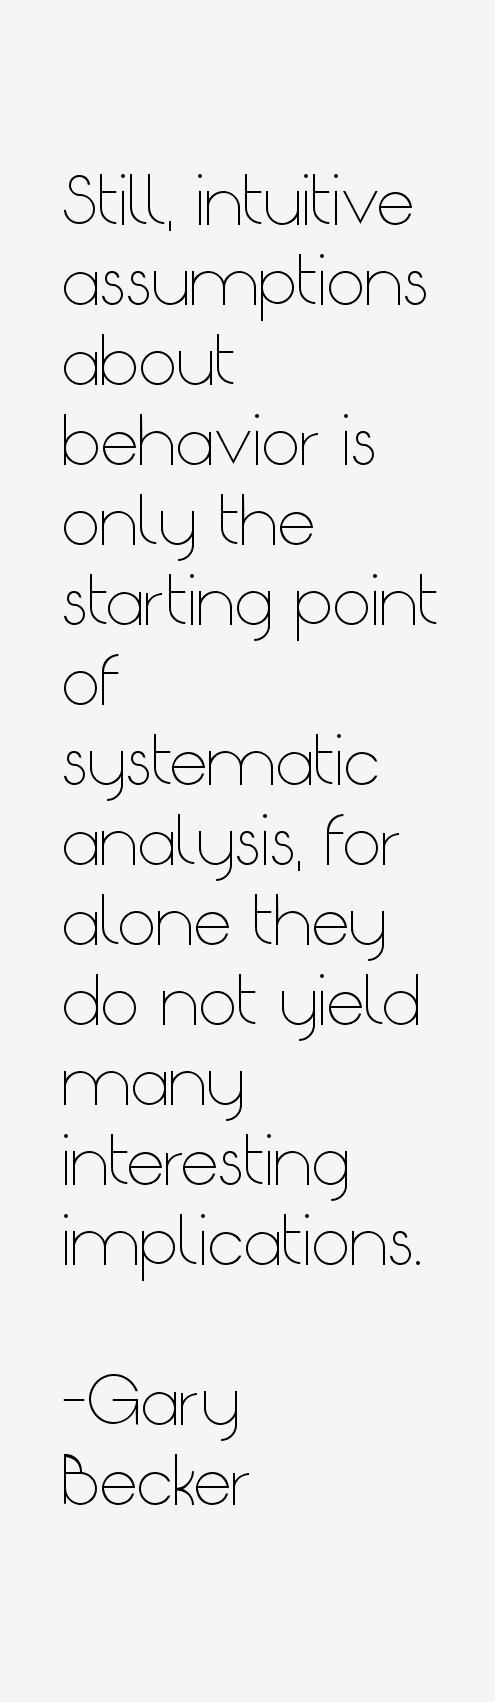 Gary Becker Quotes